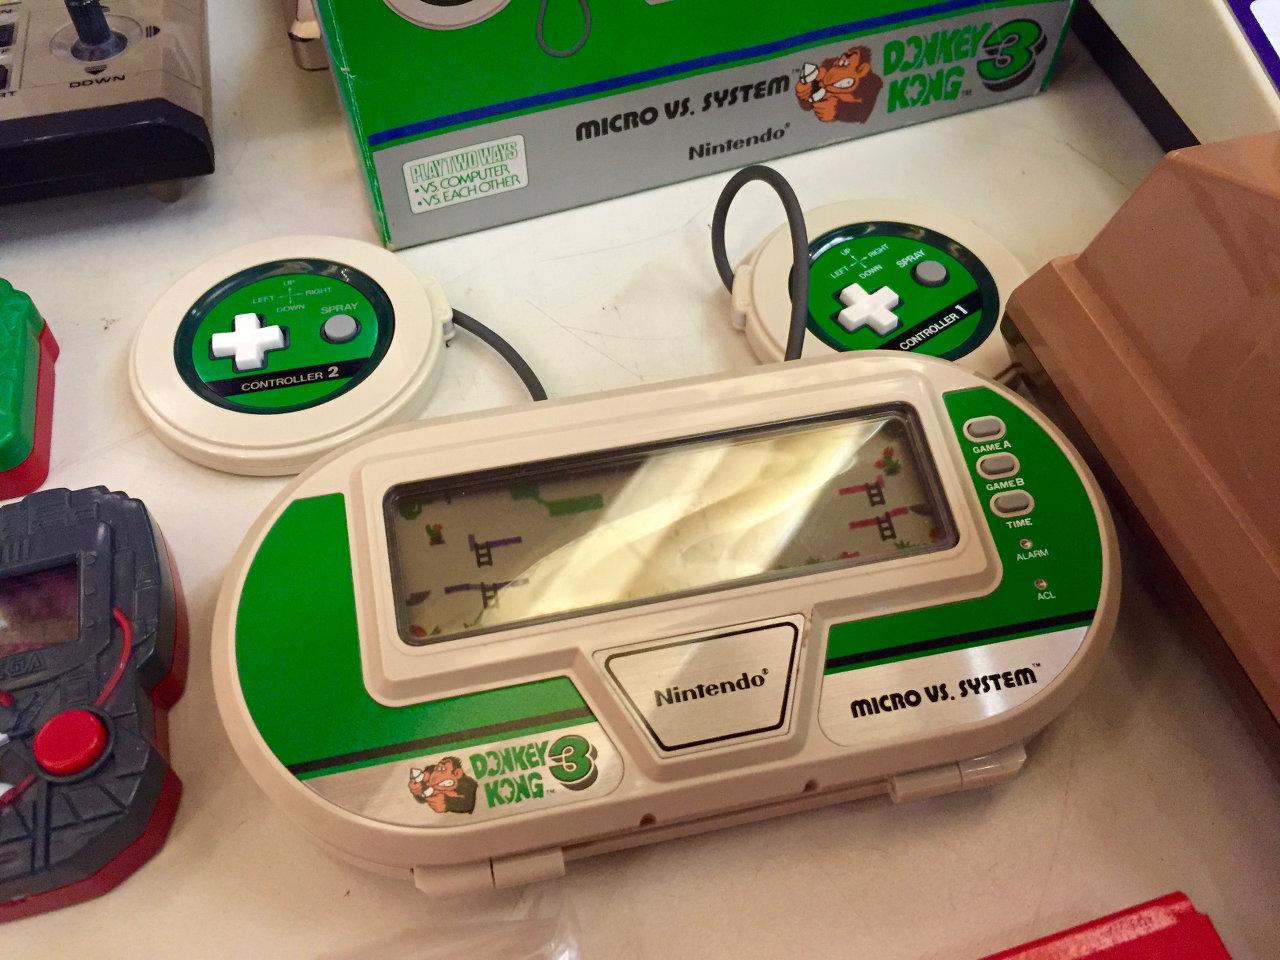 Nintendos Donkey Kong 3 als mobiles Handheld mit zwei Controllern. (Bild: André Eymann)